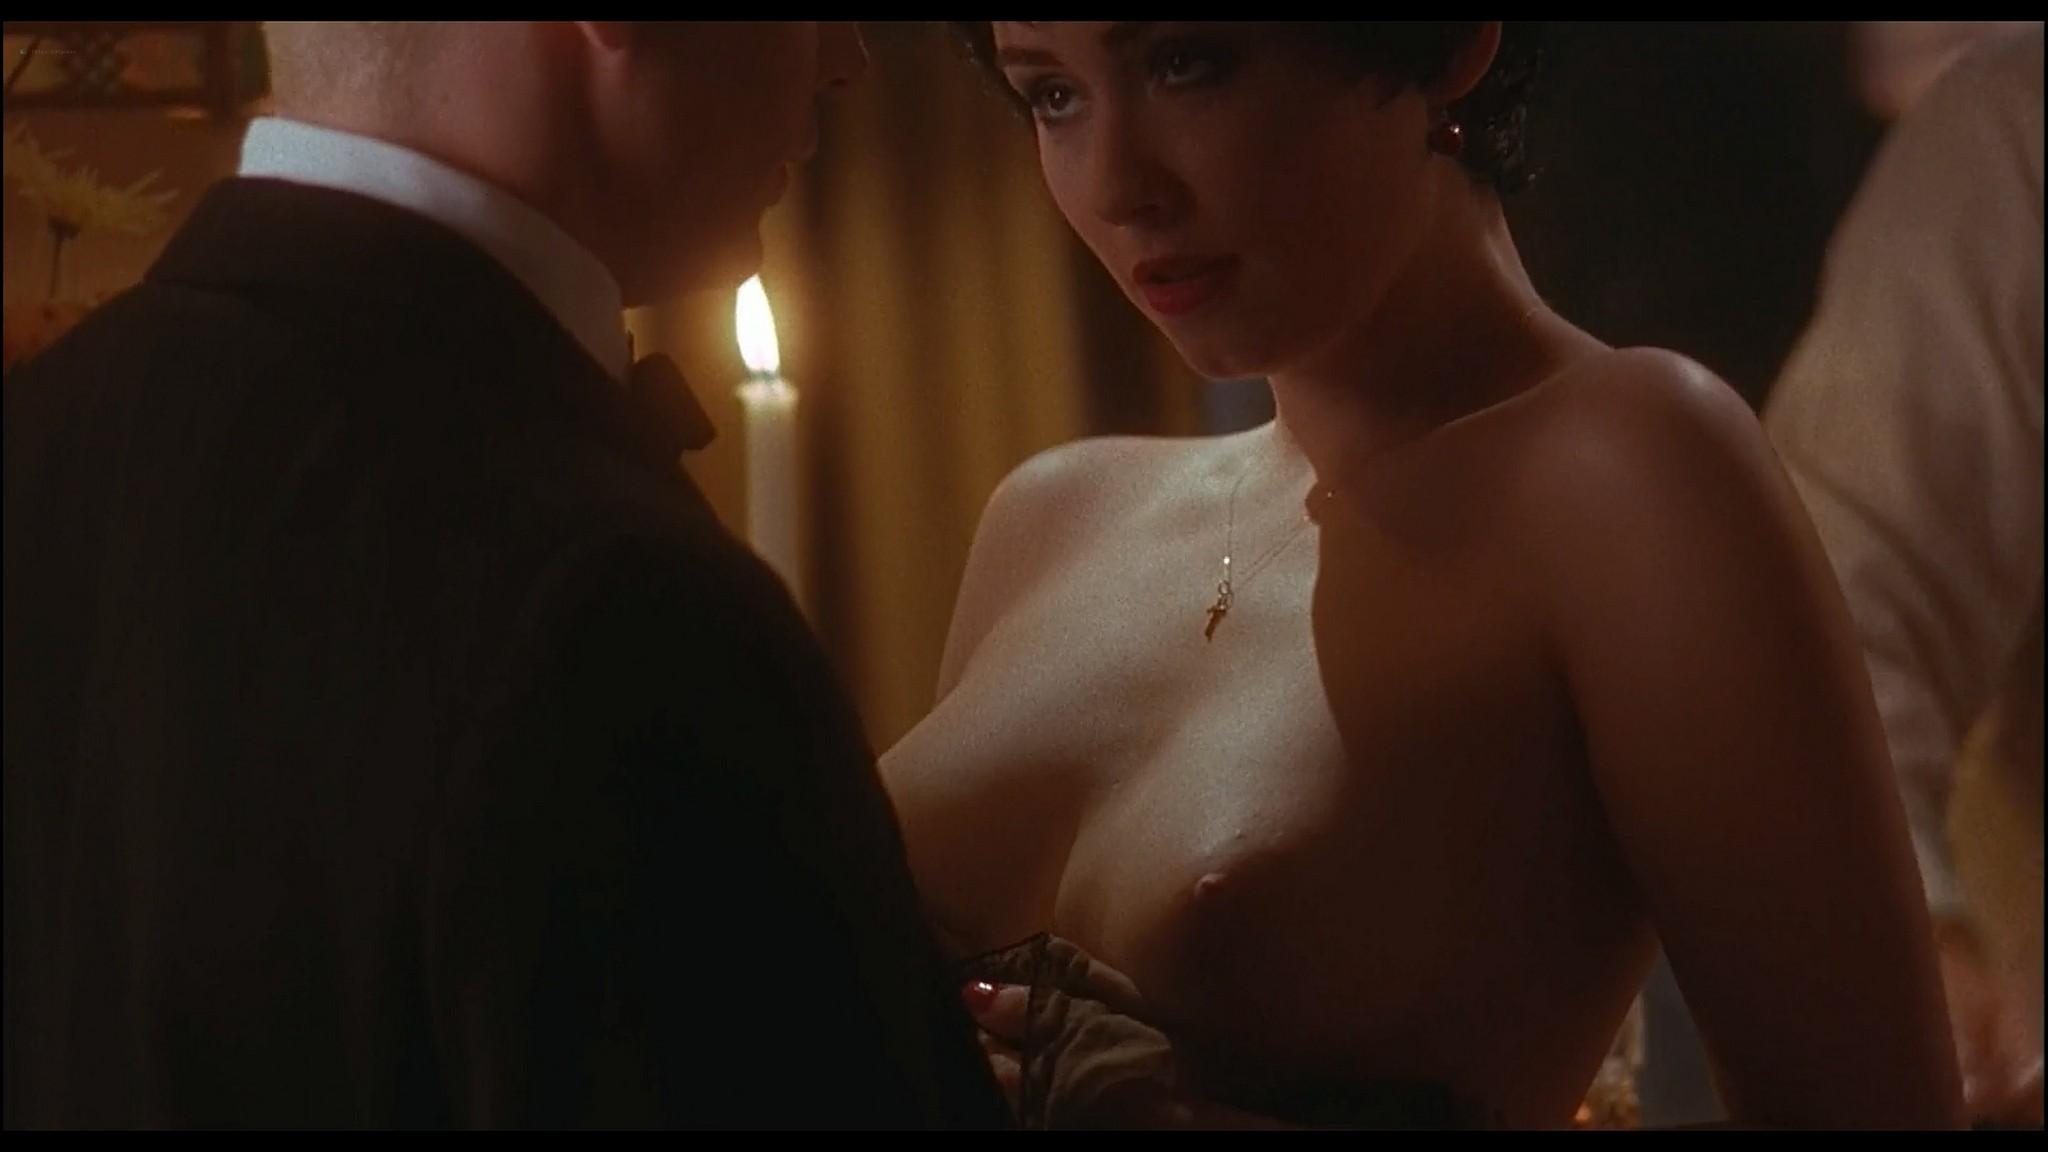 Nina Siemaszko nude sex Lydie Denier Gloria Reuben and others nude sex Wild Orchid 2 1992 1080p BluRay 16